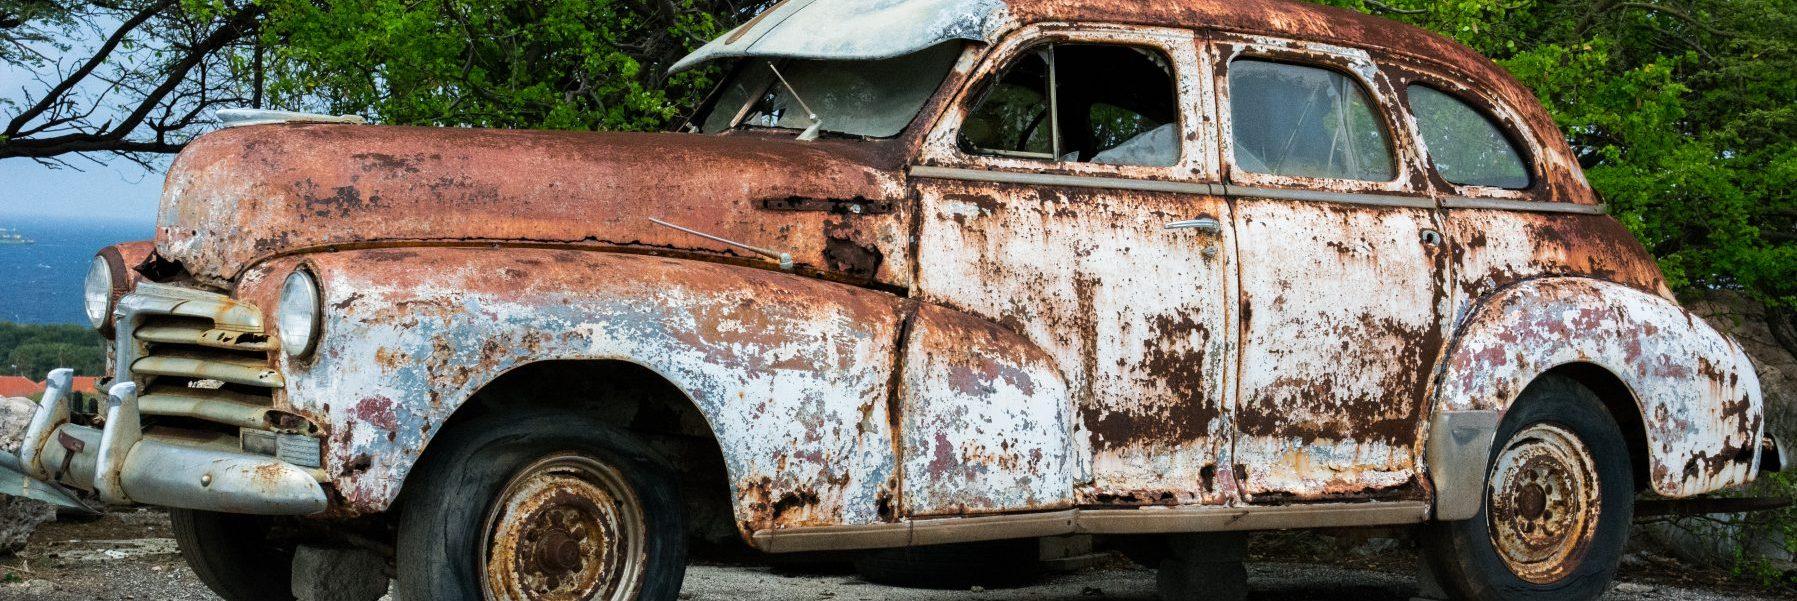 anti corrosion coating car